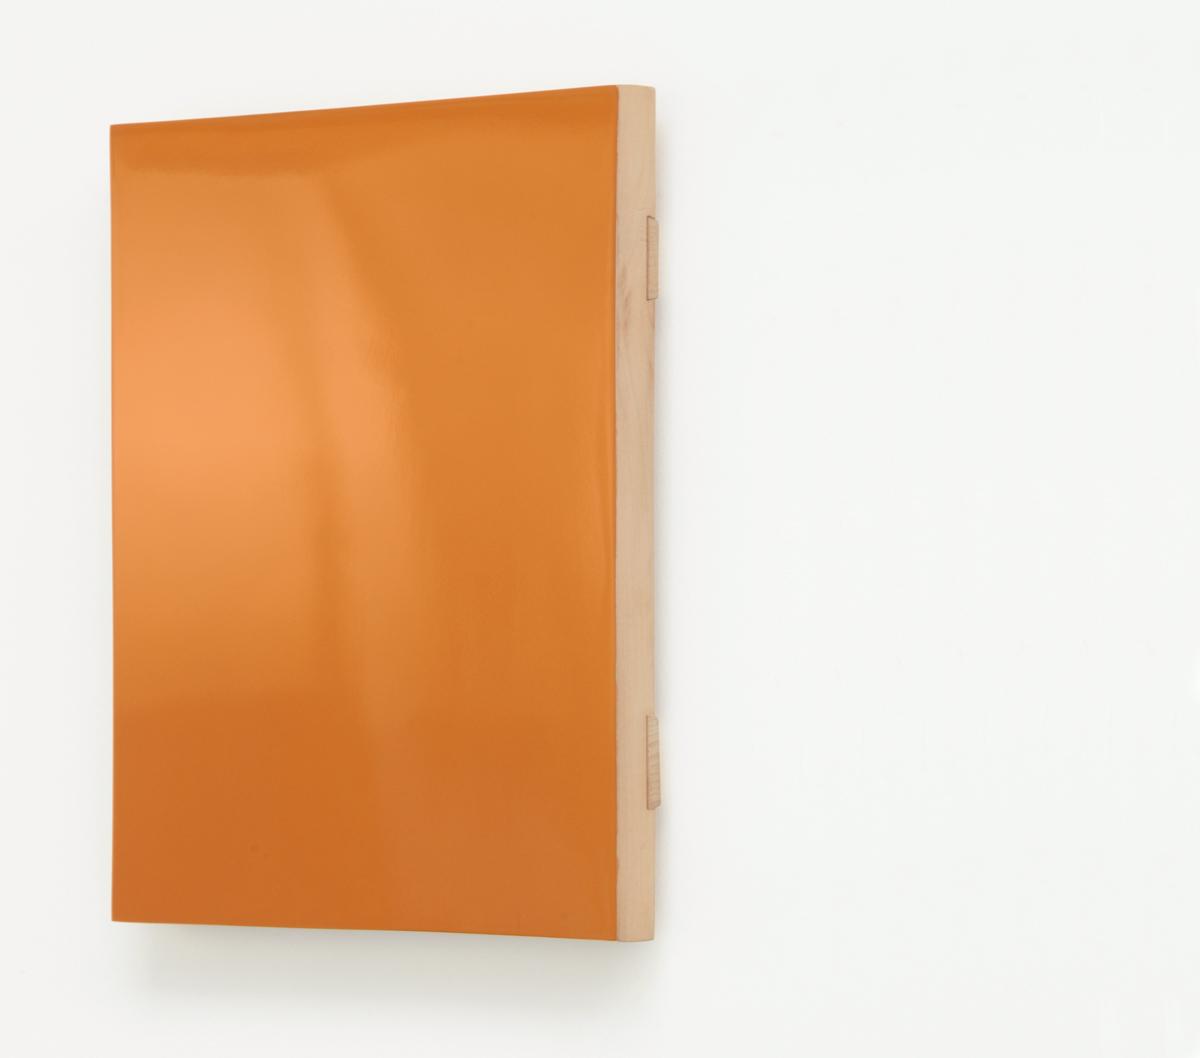 KOZAKIS - Corvette_GM_Atomic_Orange-Met_2007_39,5x28,5cm